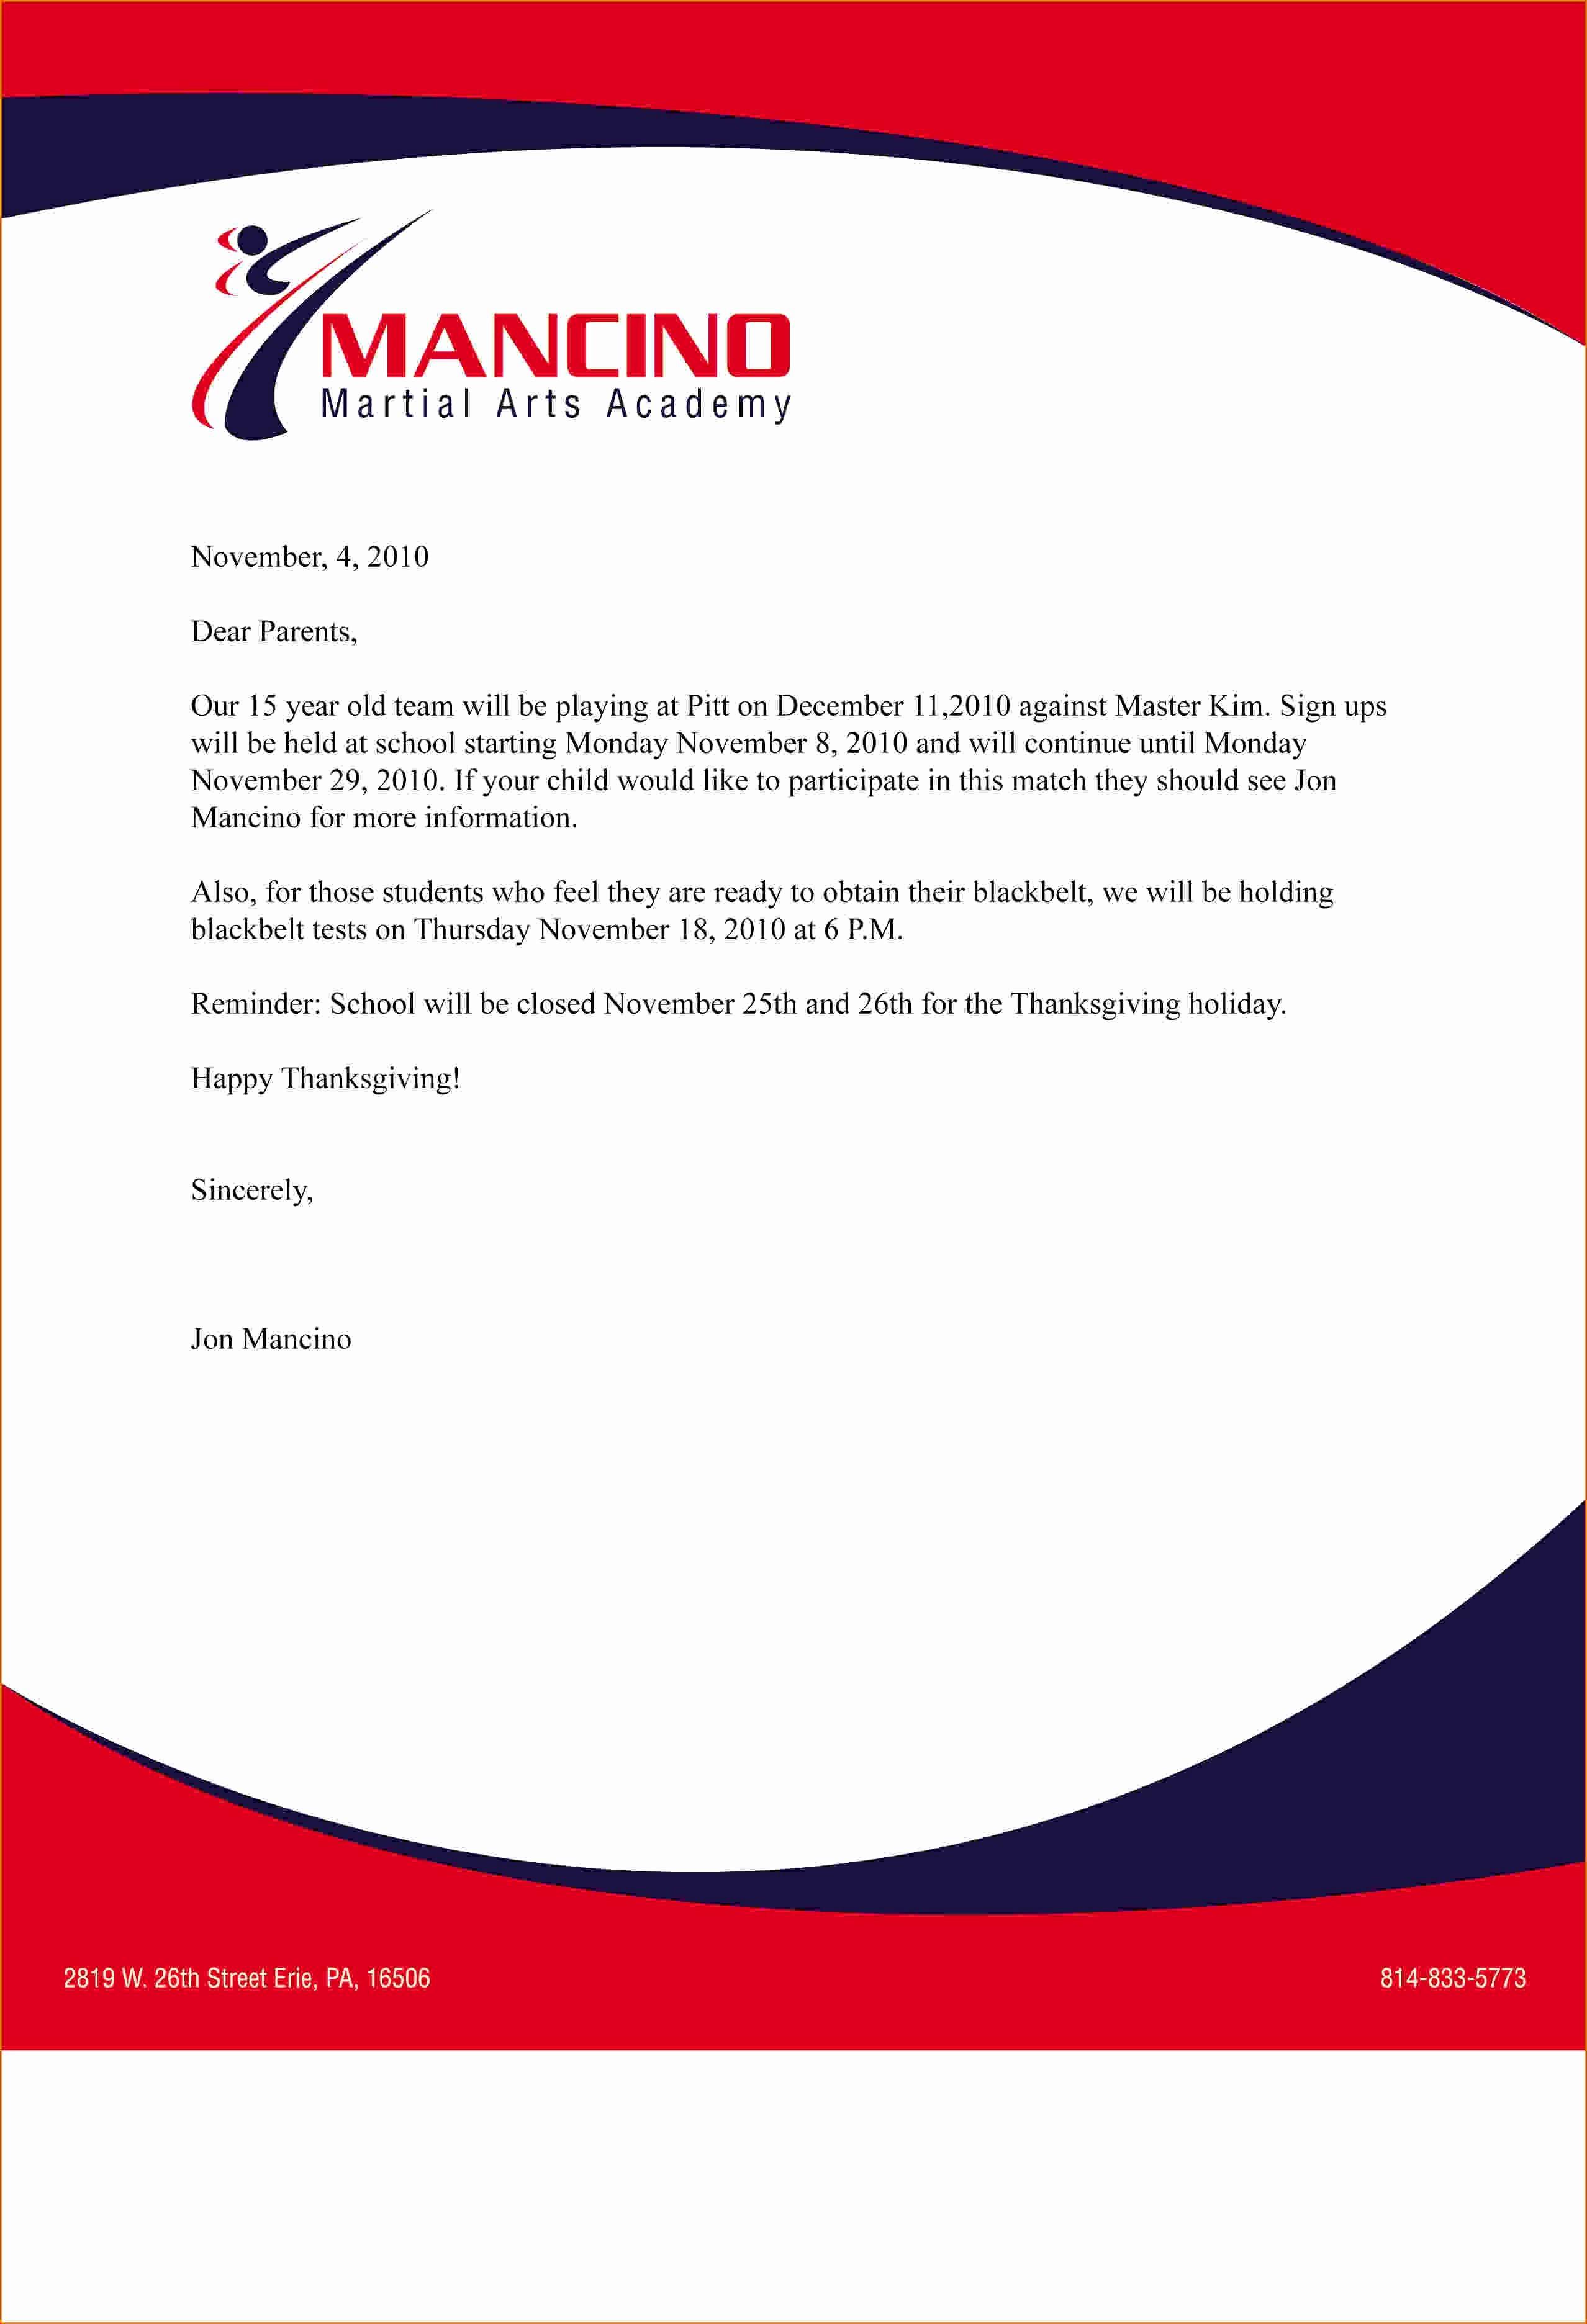 Sample Business Letter On Letterhead Luxury Pin by Amirah Dayana On Letterhead